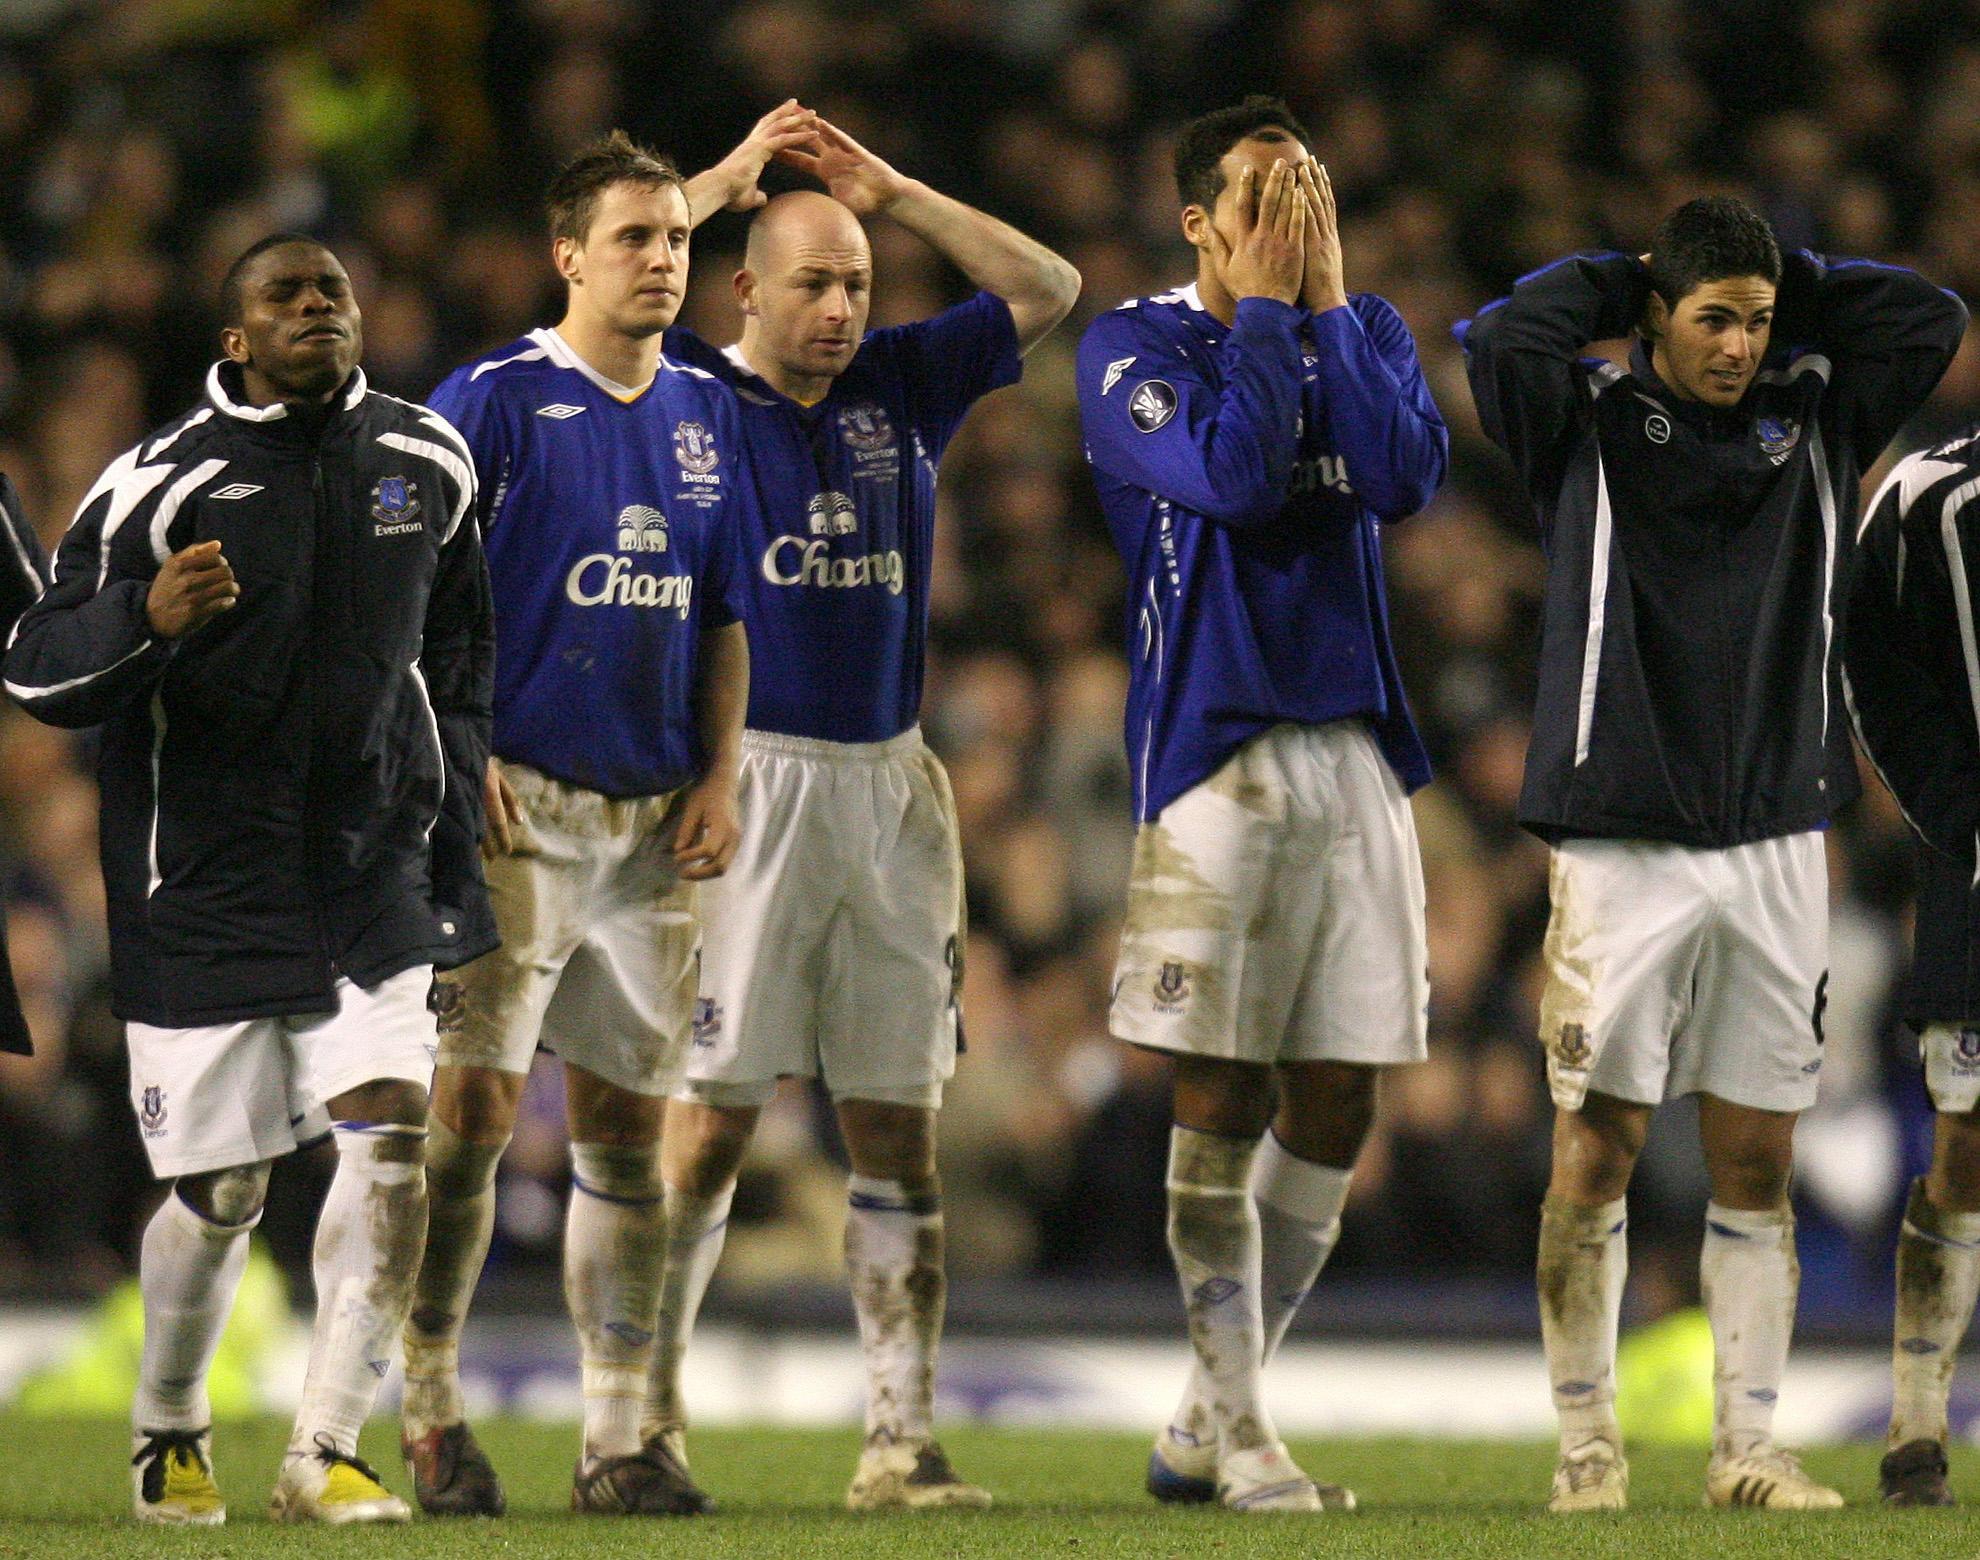 Soccer - UEFA Cup - Round Of 16 - Second Leg - Everton v Fiorentina - Goodison Park